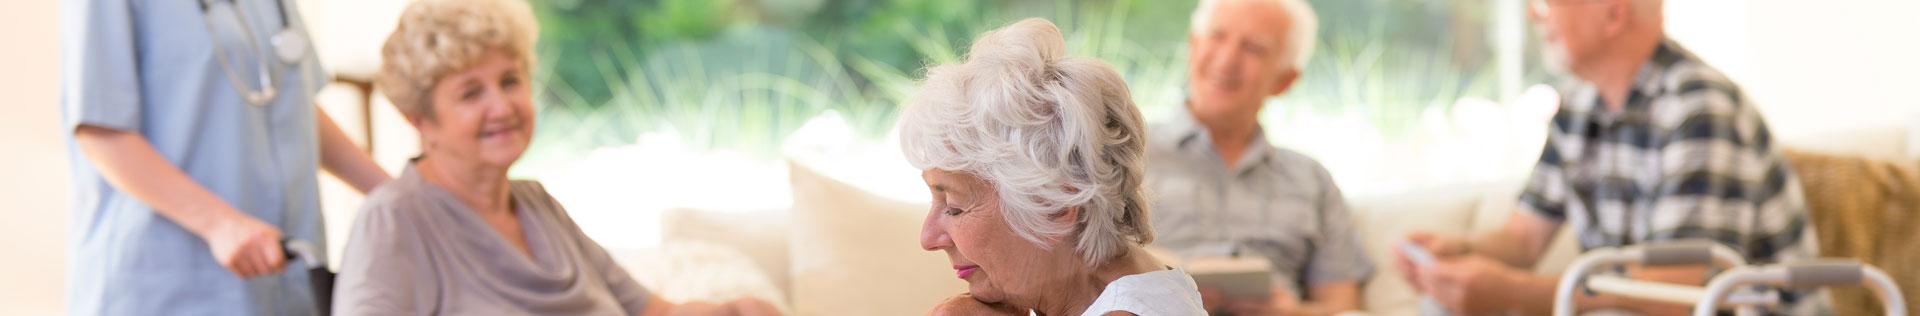 Whole Person Memory Care in Naperville Monarch Landing